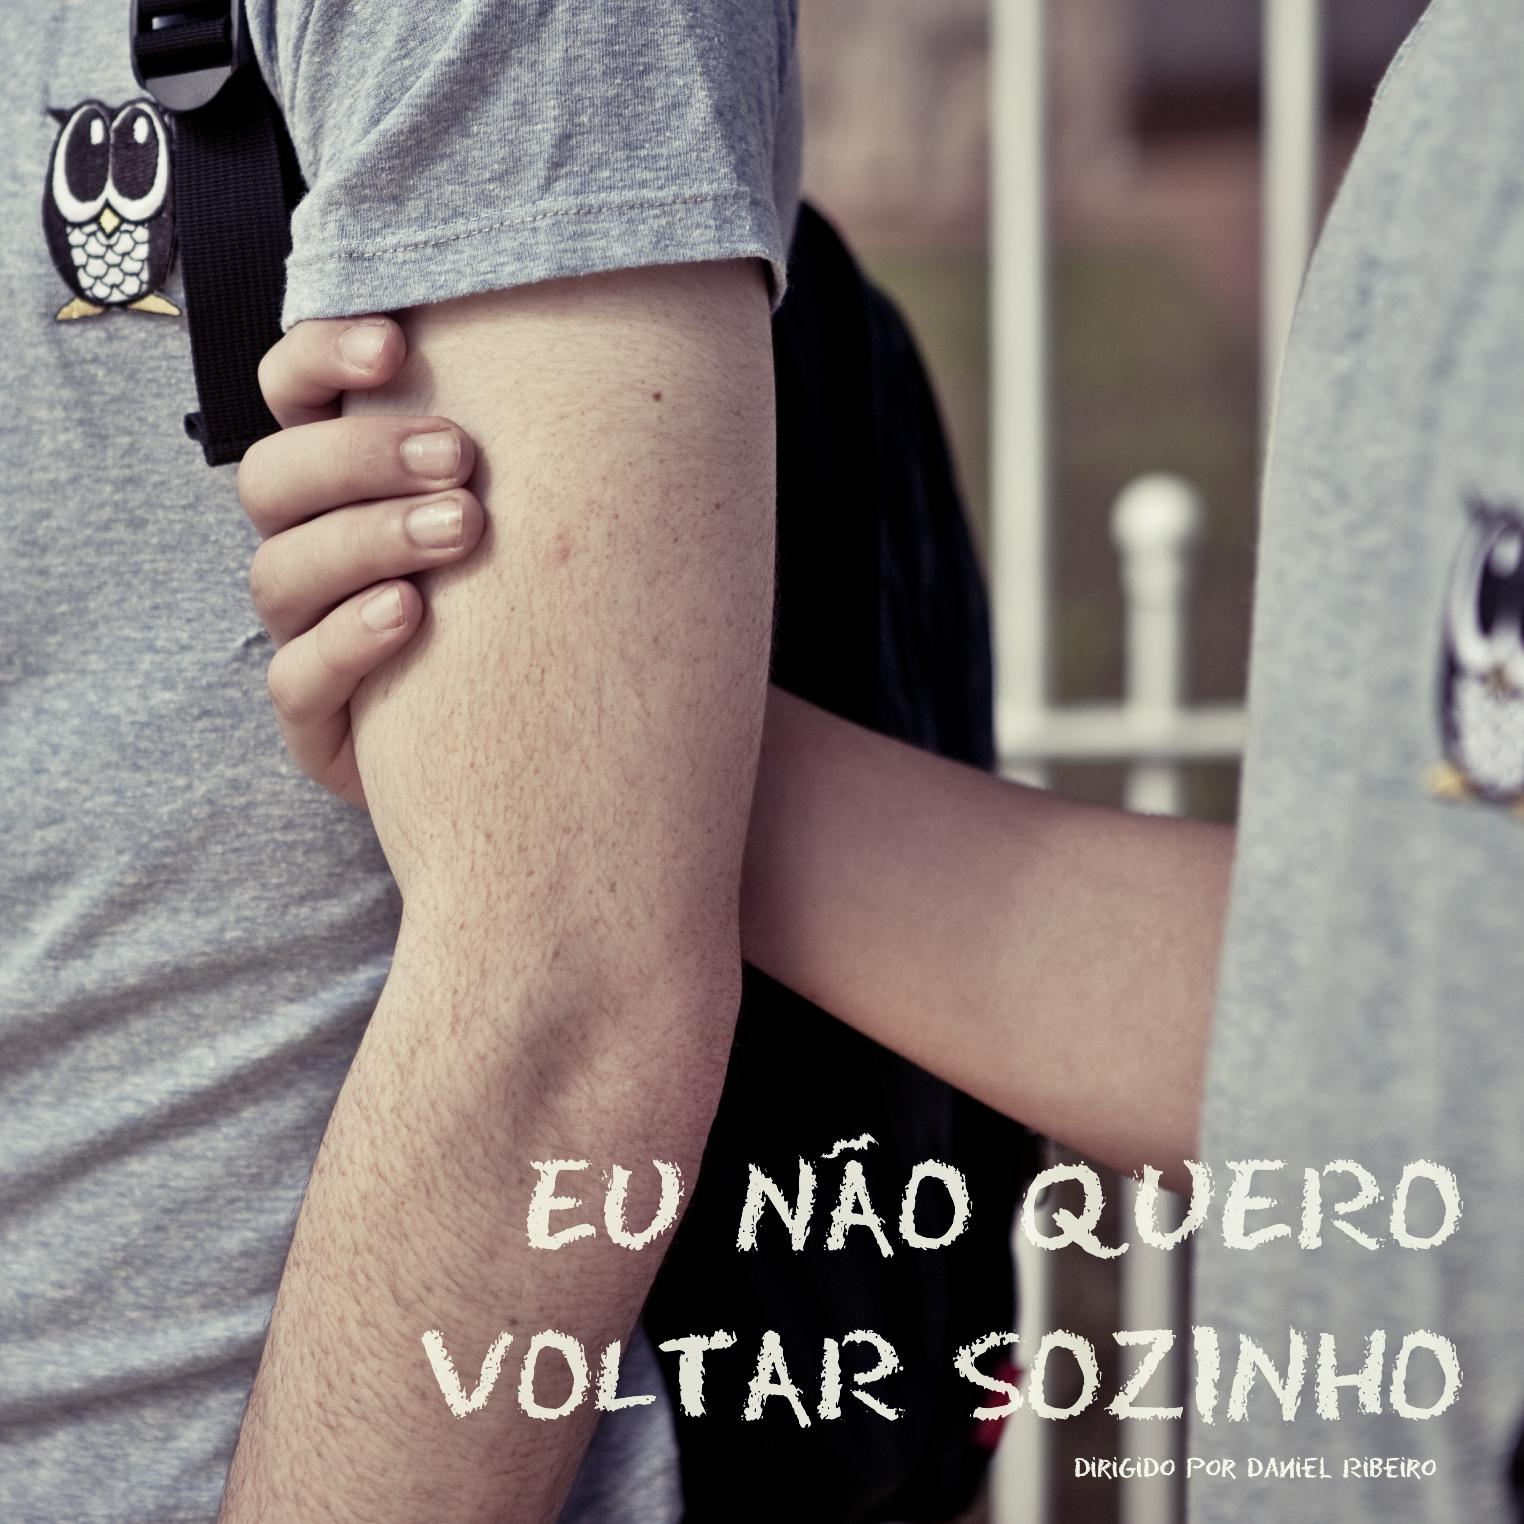 Guilherme lobo fabio audi dating 9